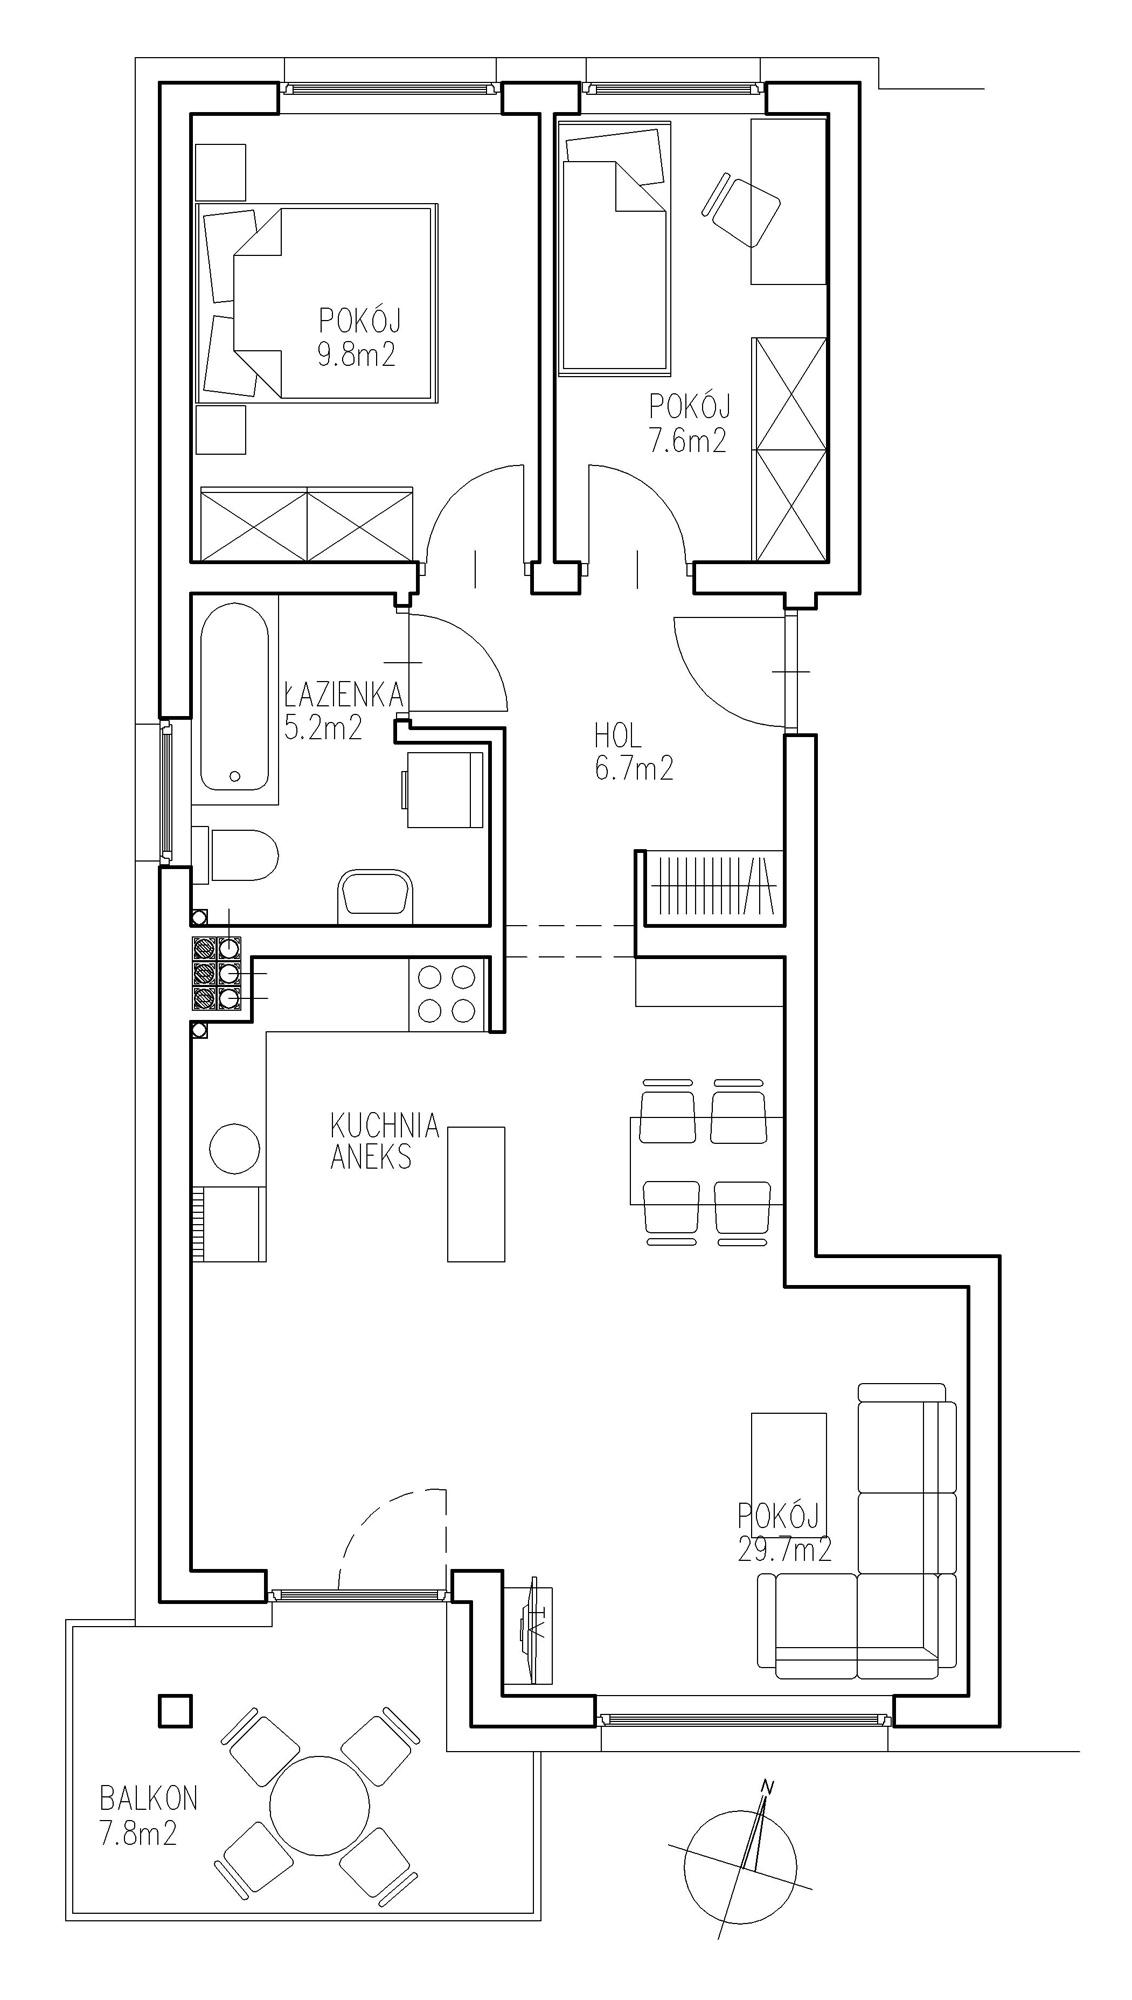 KTK Deweloper - Ełk - ul. Ogrodowa - Blok nr 2 - Mieszkanie nr 16